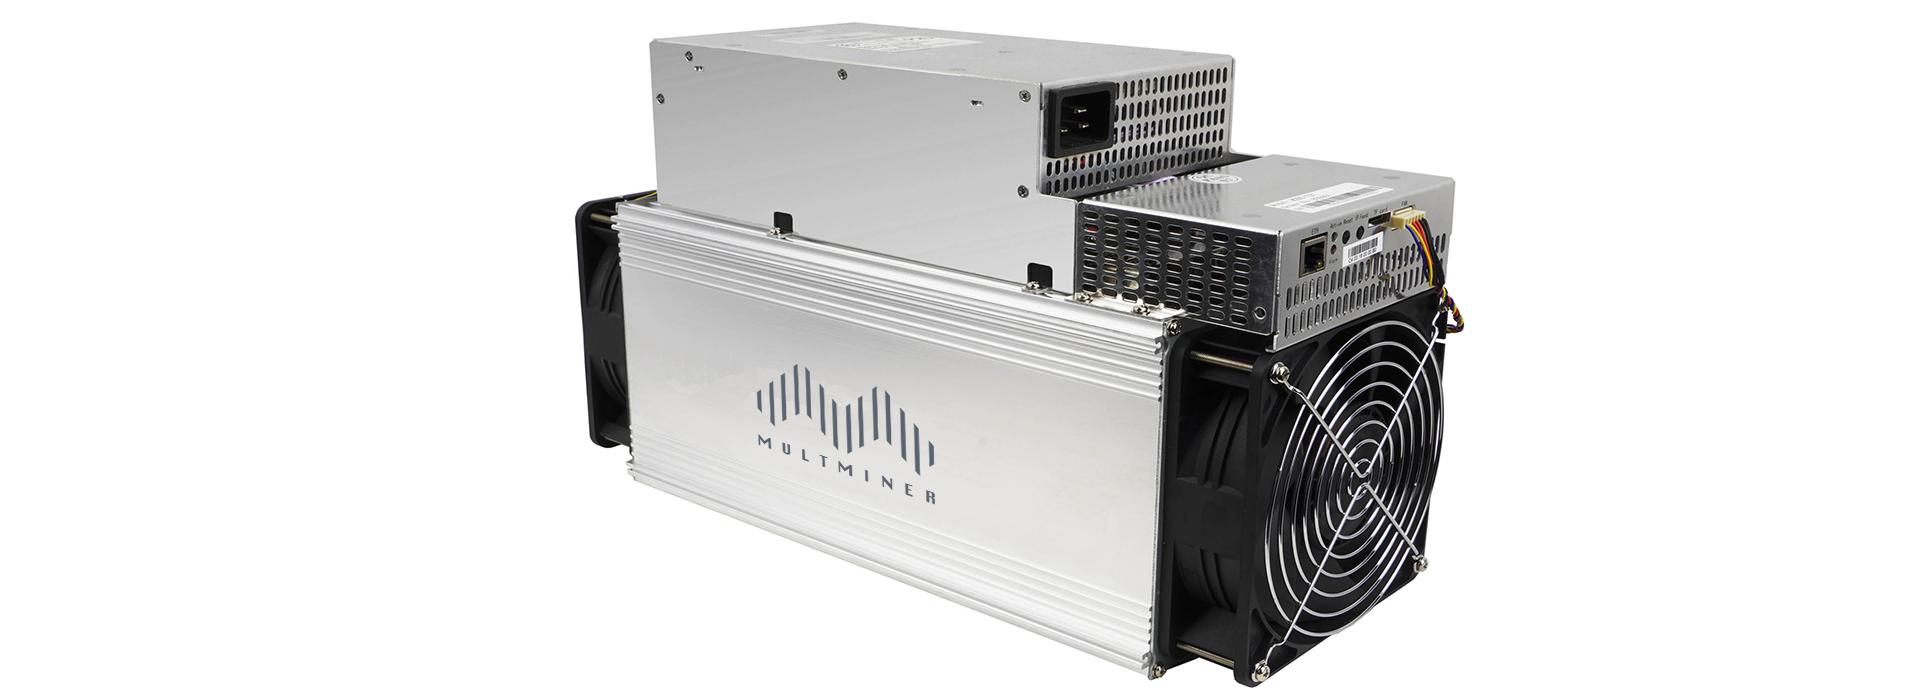 M1 多币种FPGA矿机